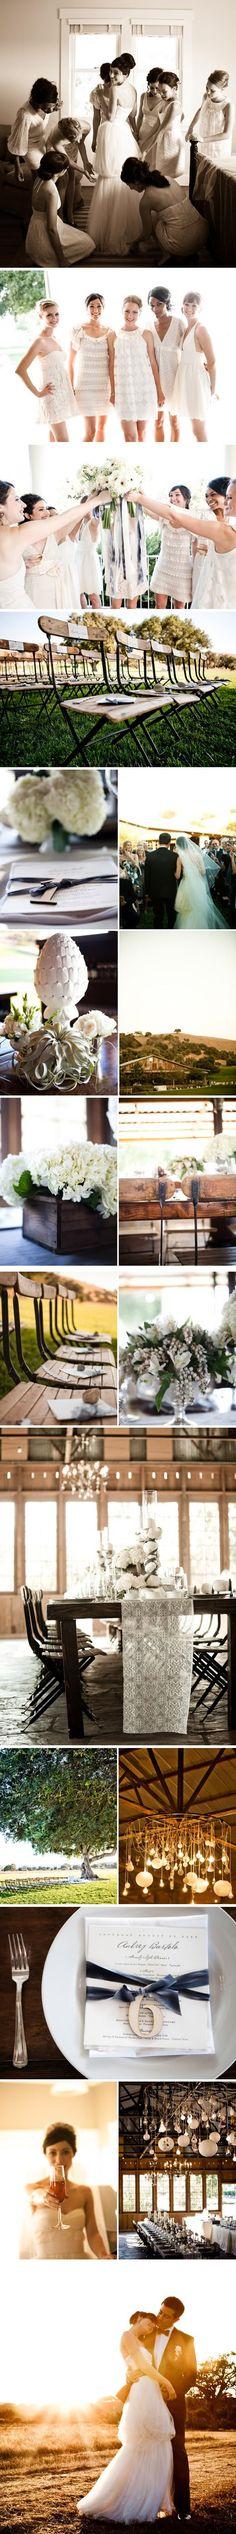 Black, white and grey wedding